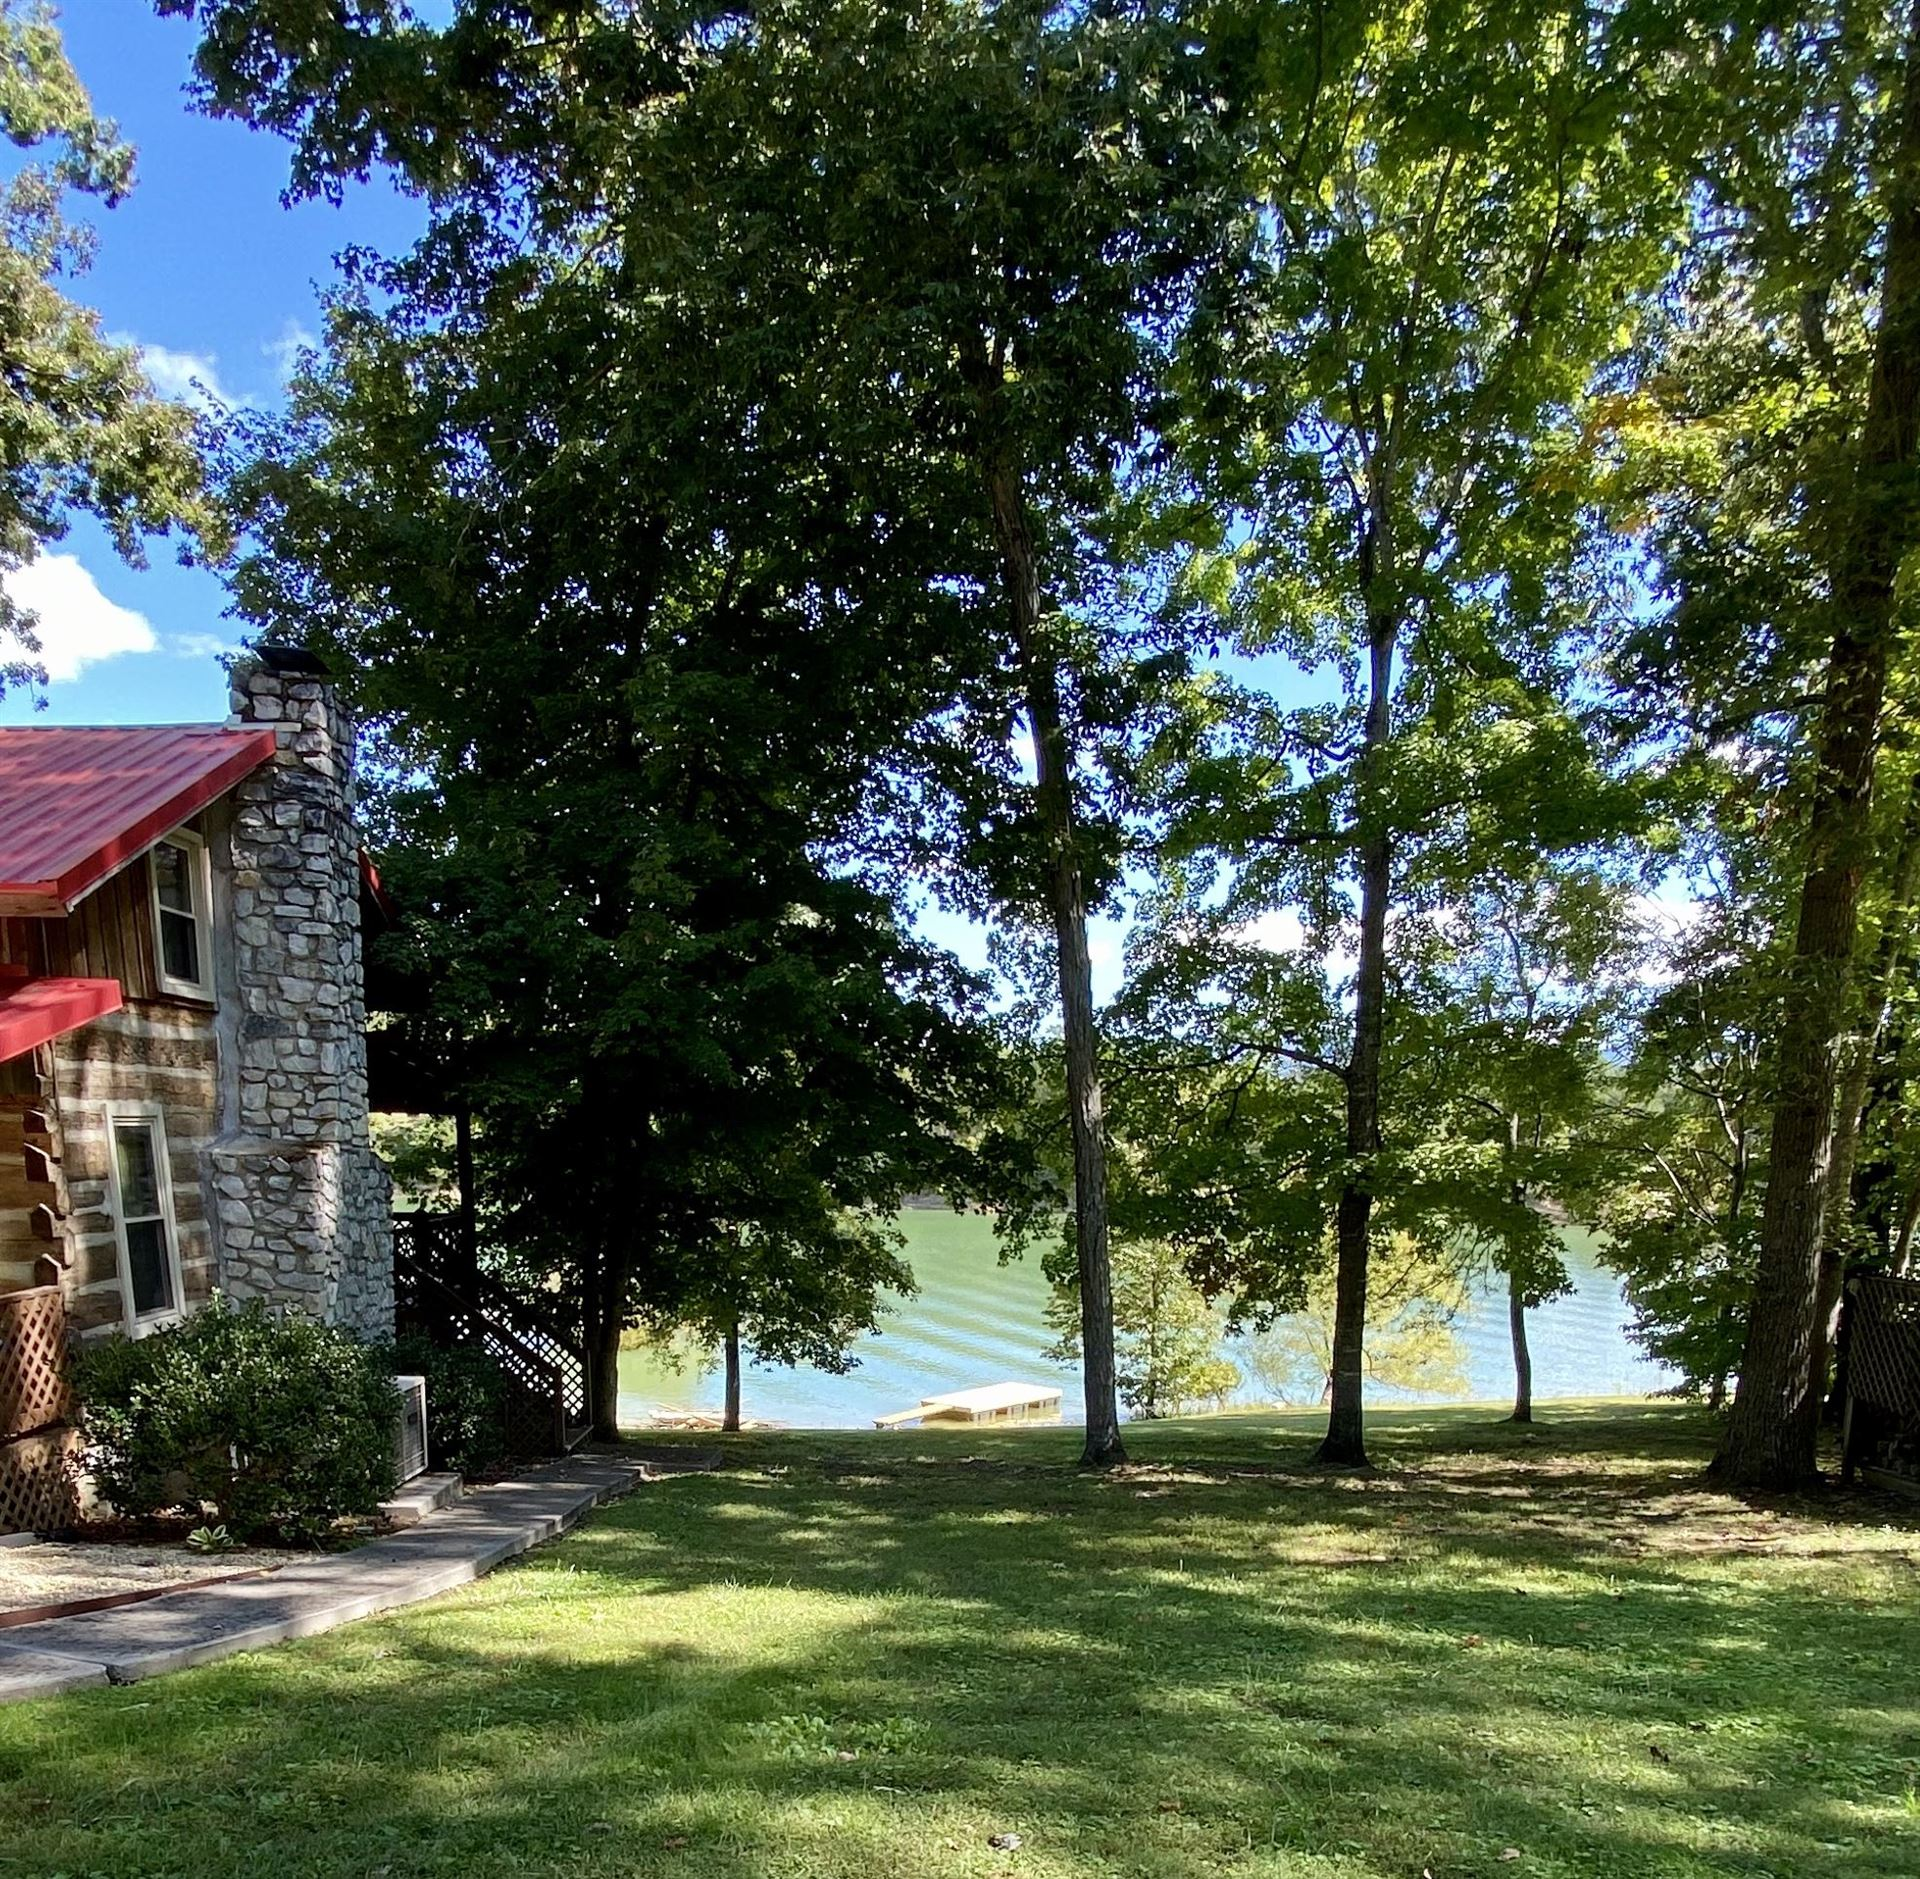 Photo of 2124 Key Way, Sevierville, TN 37876 (MLS # 1132401)